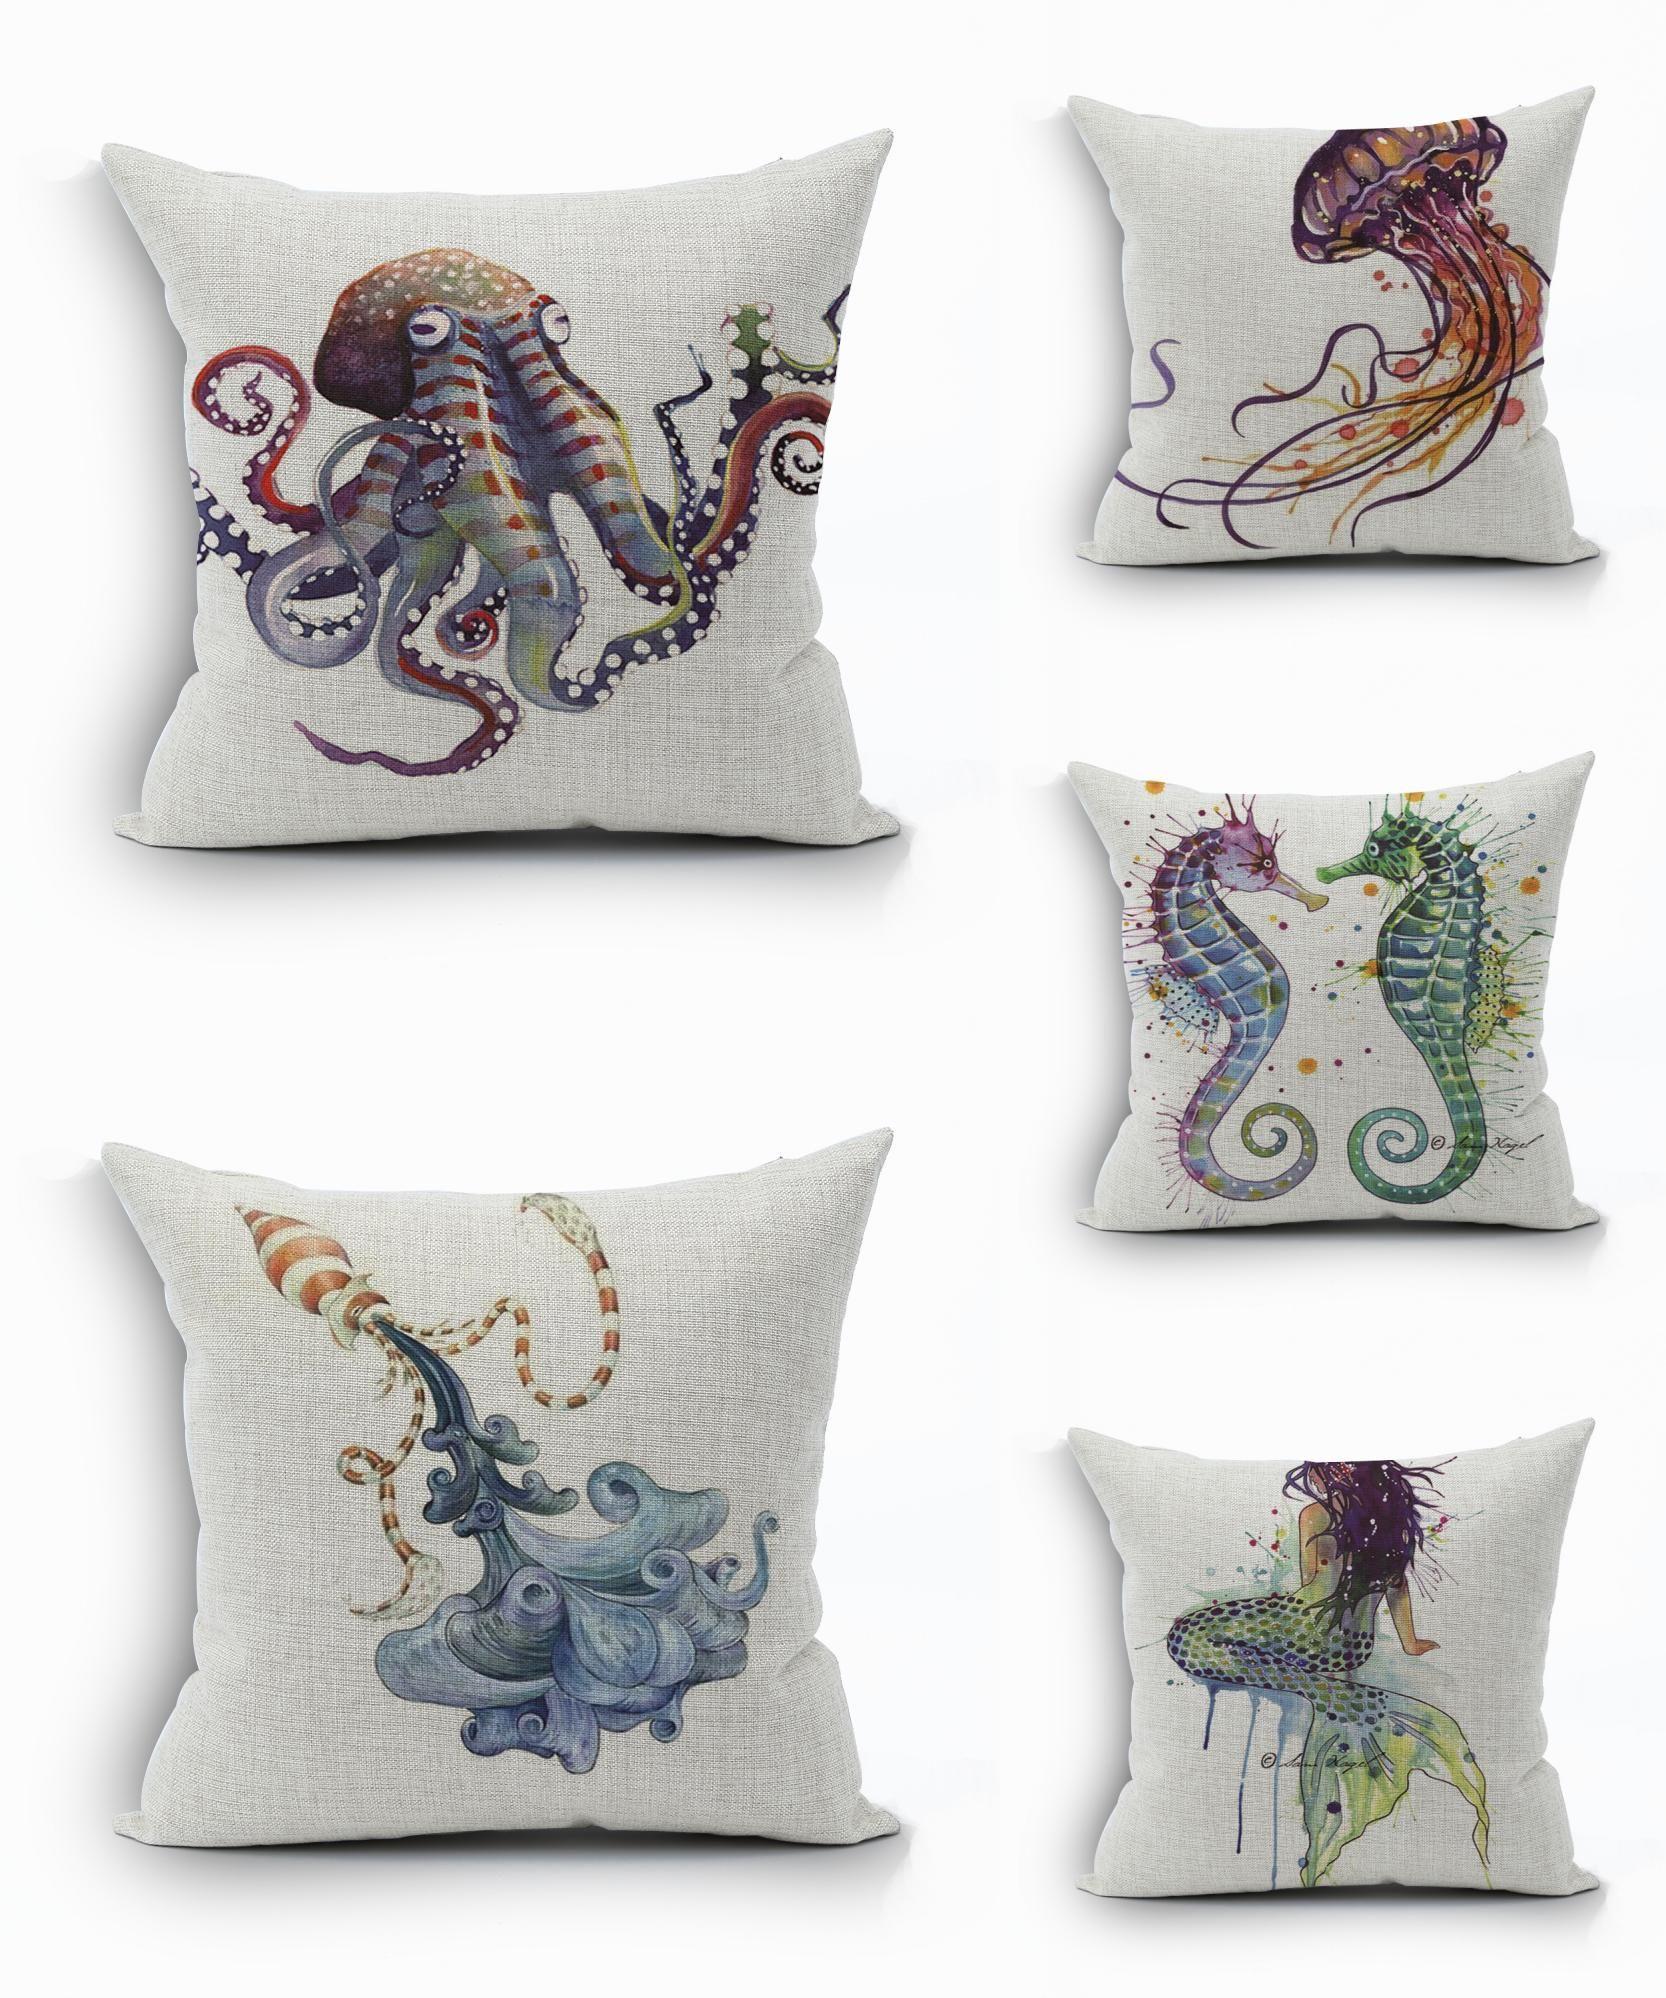 Visit To 2016 Real Capa De Almofada Decorative Pillows Sea Marine Style Beach Cushion Cover Pionate Printed Sofa Throw Pillow Case